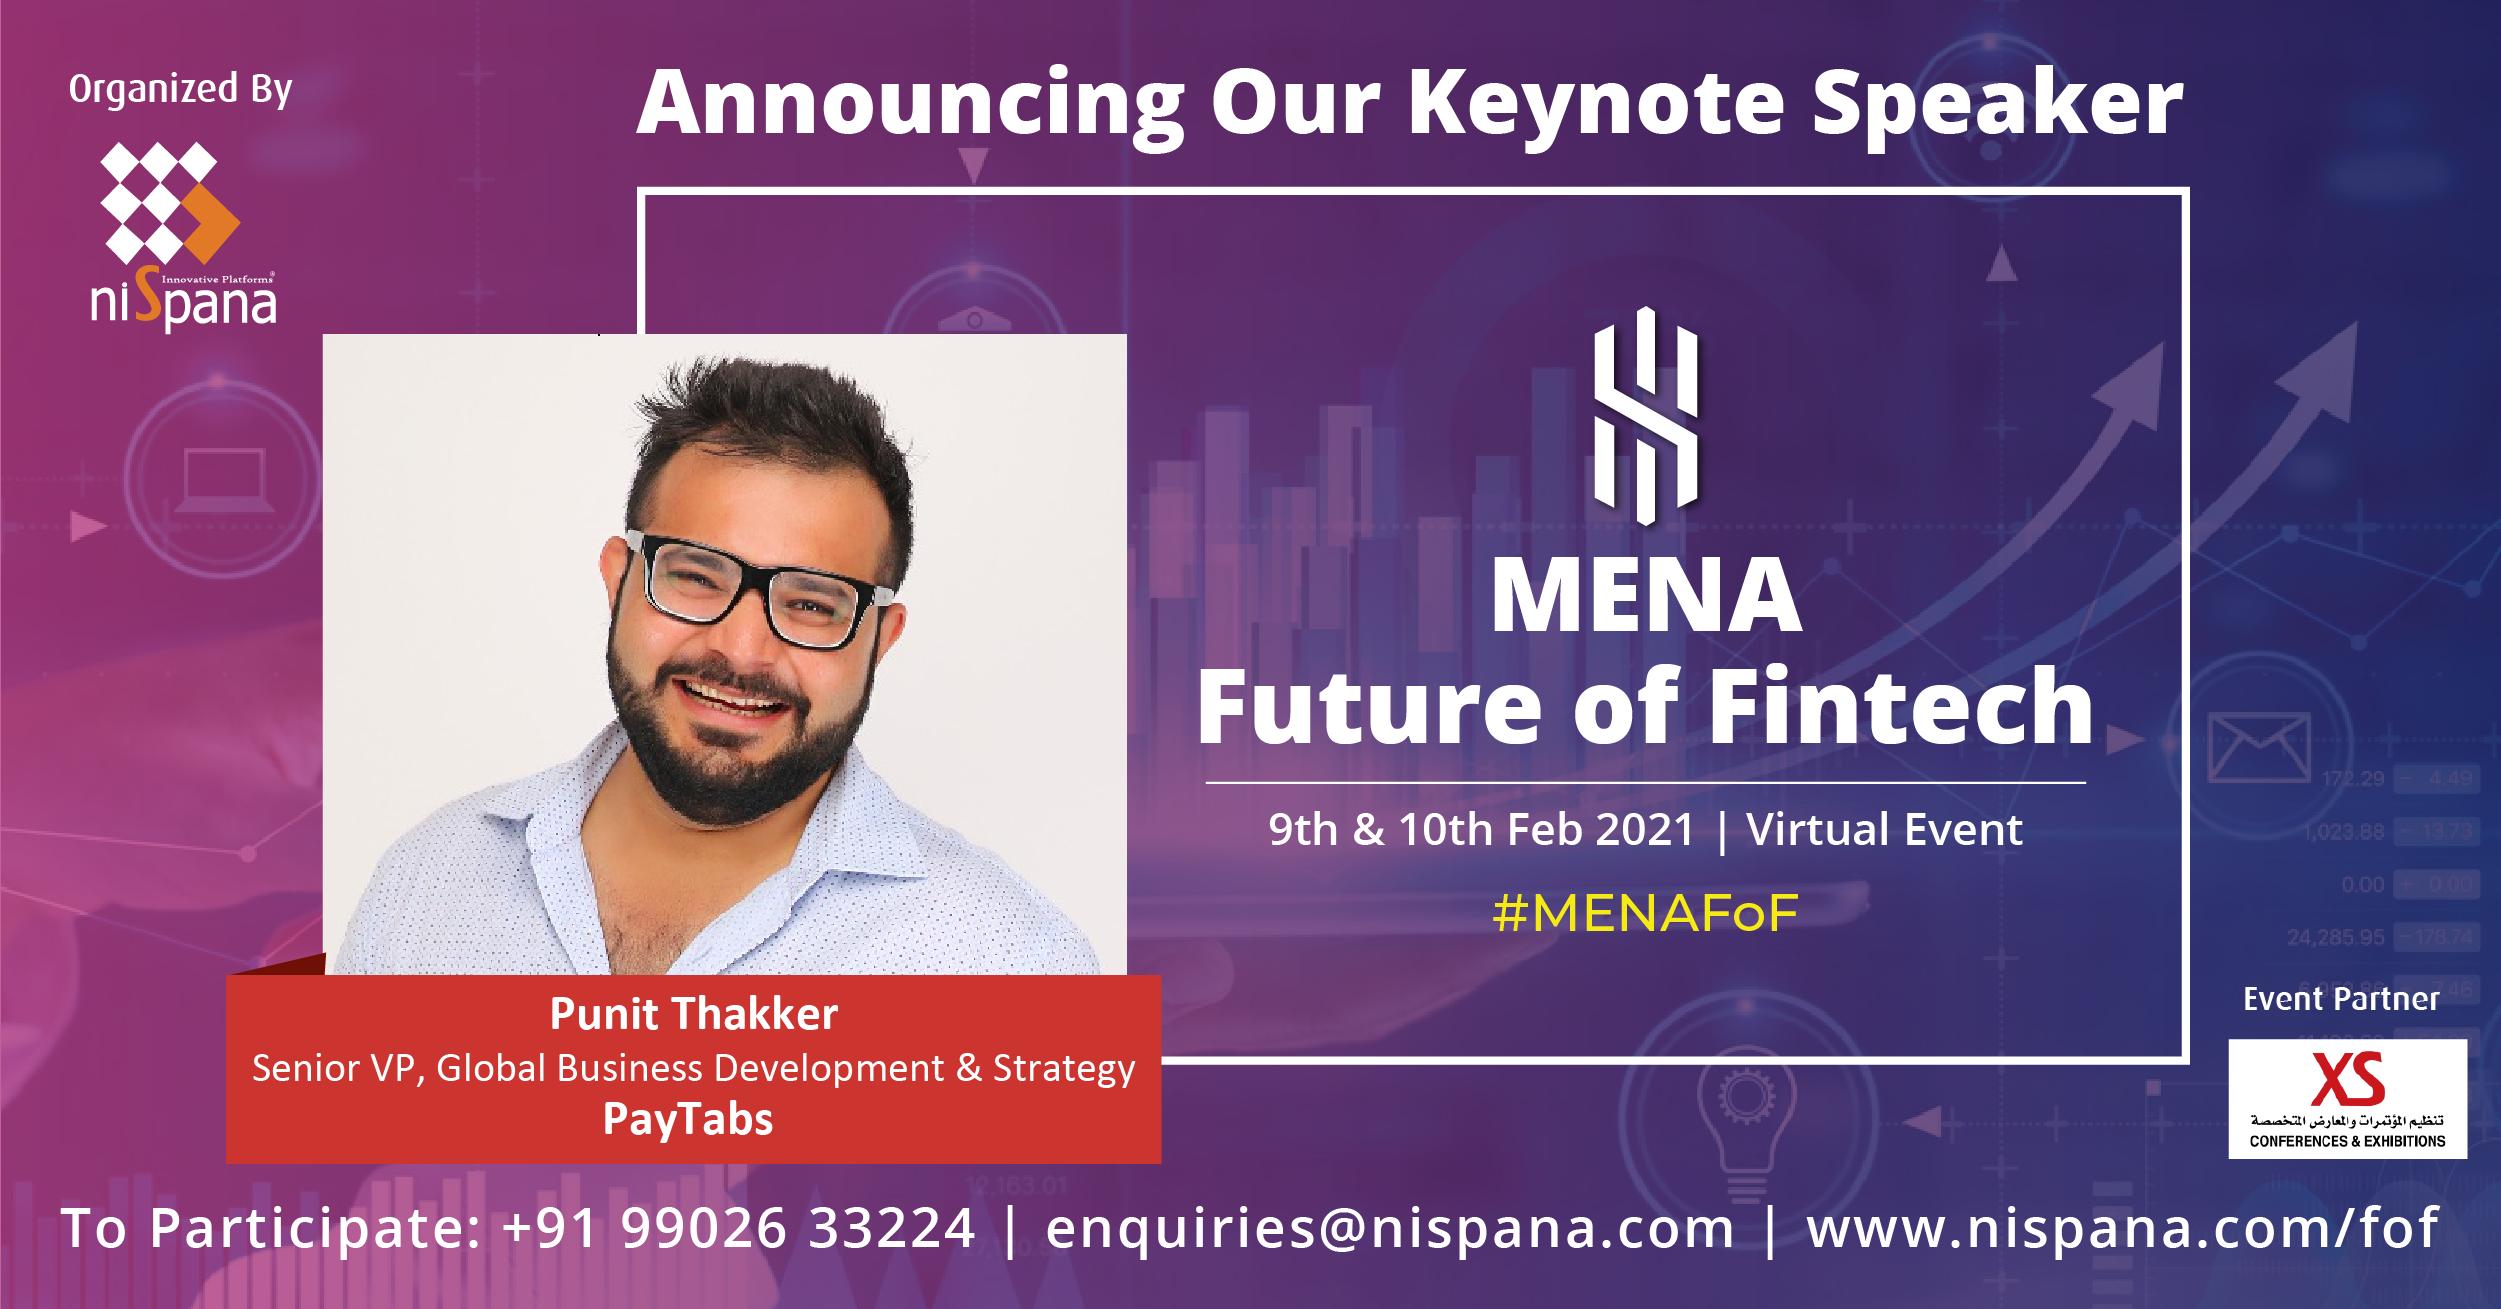 MENA Future of Fintech